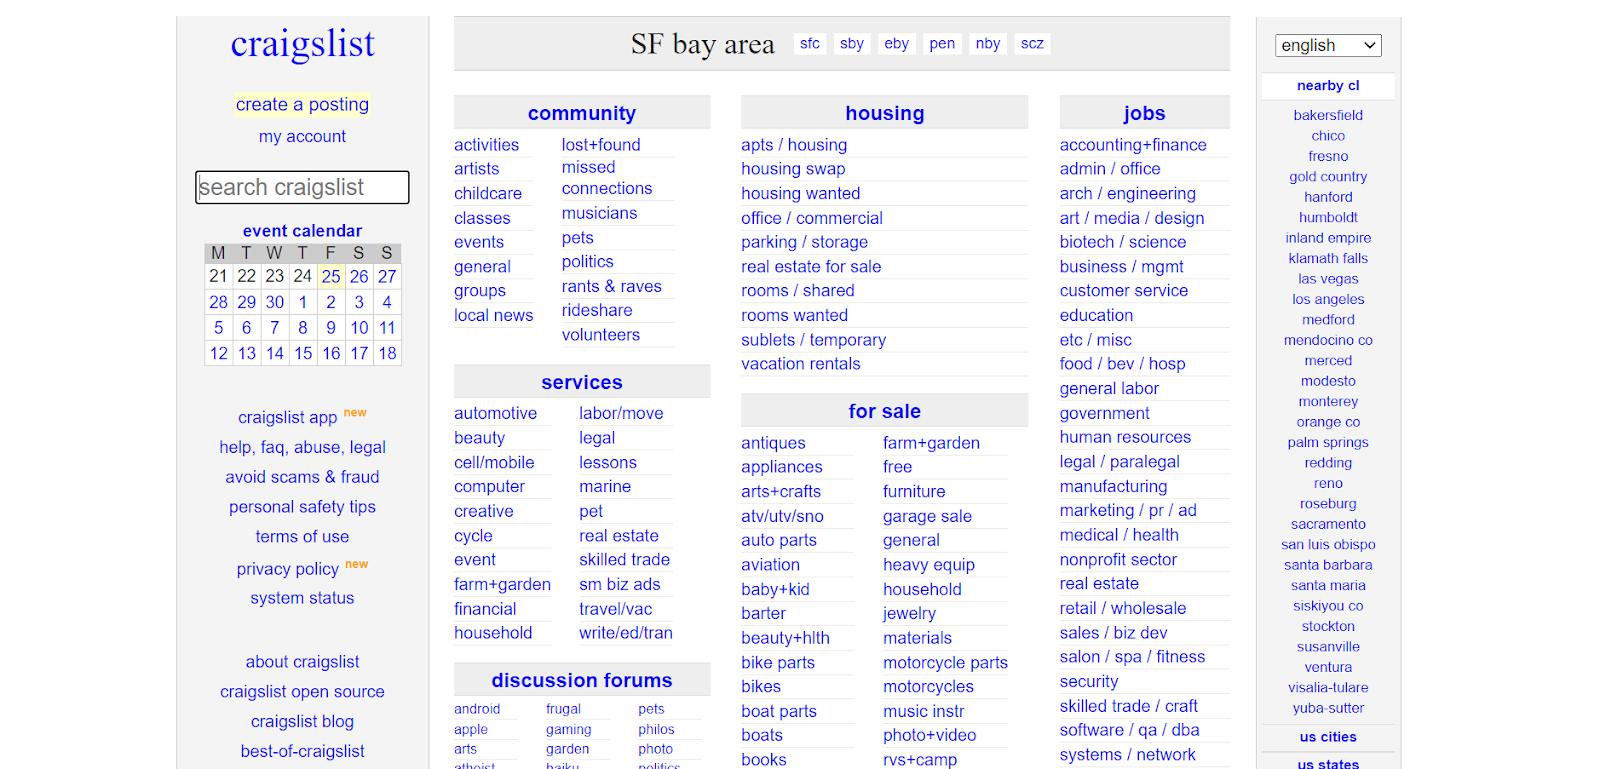 best free advertising sites - Craigslist